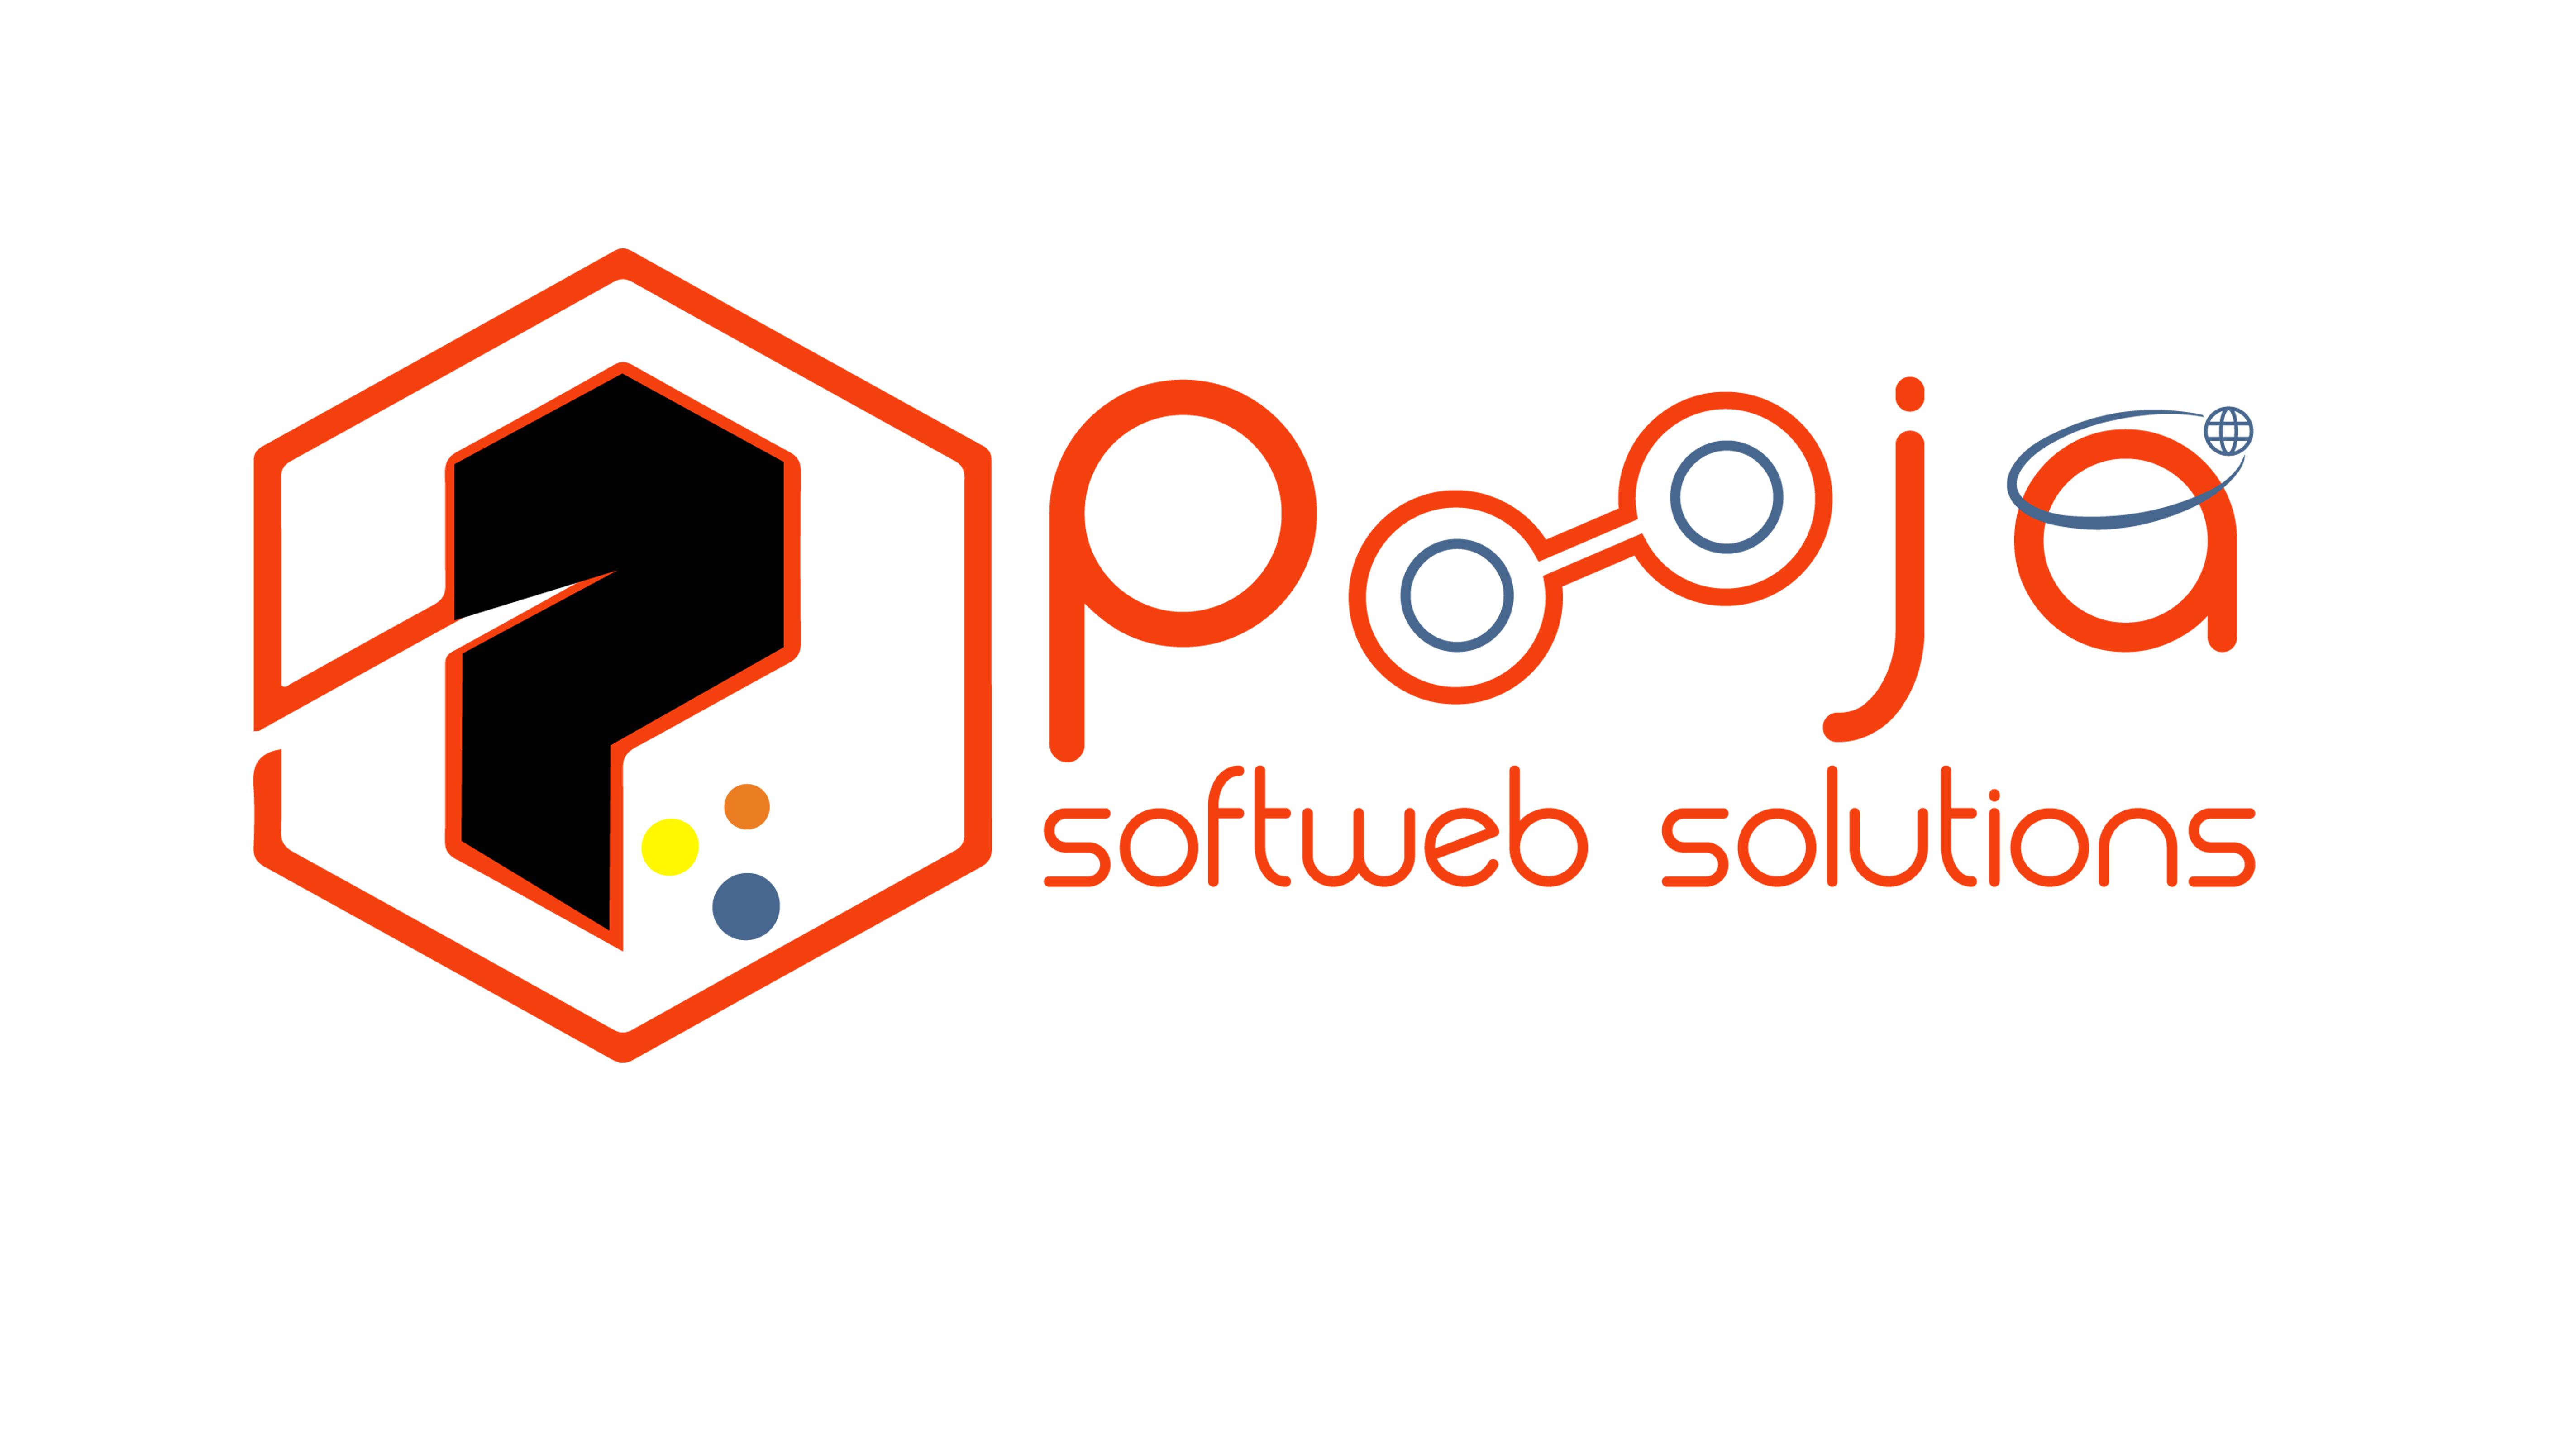 poojasoftwebsolutions